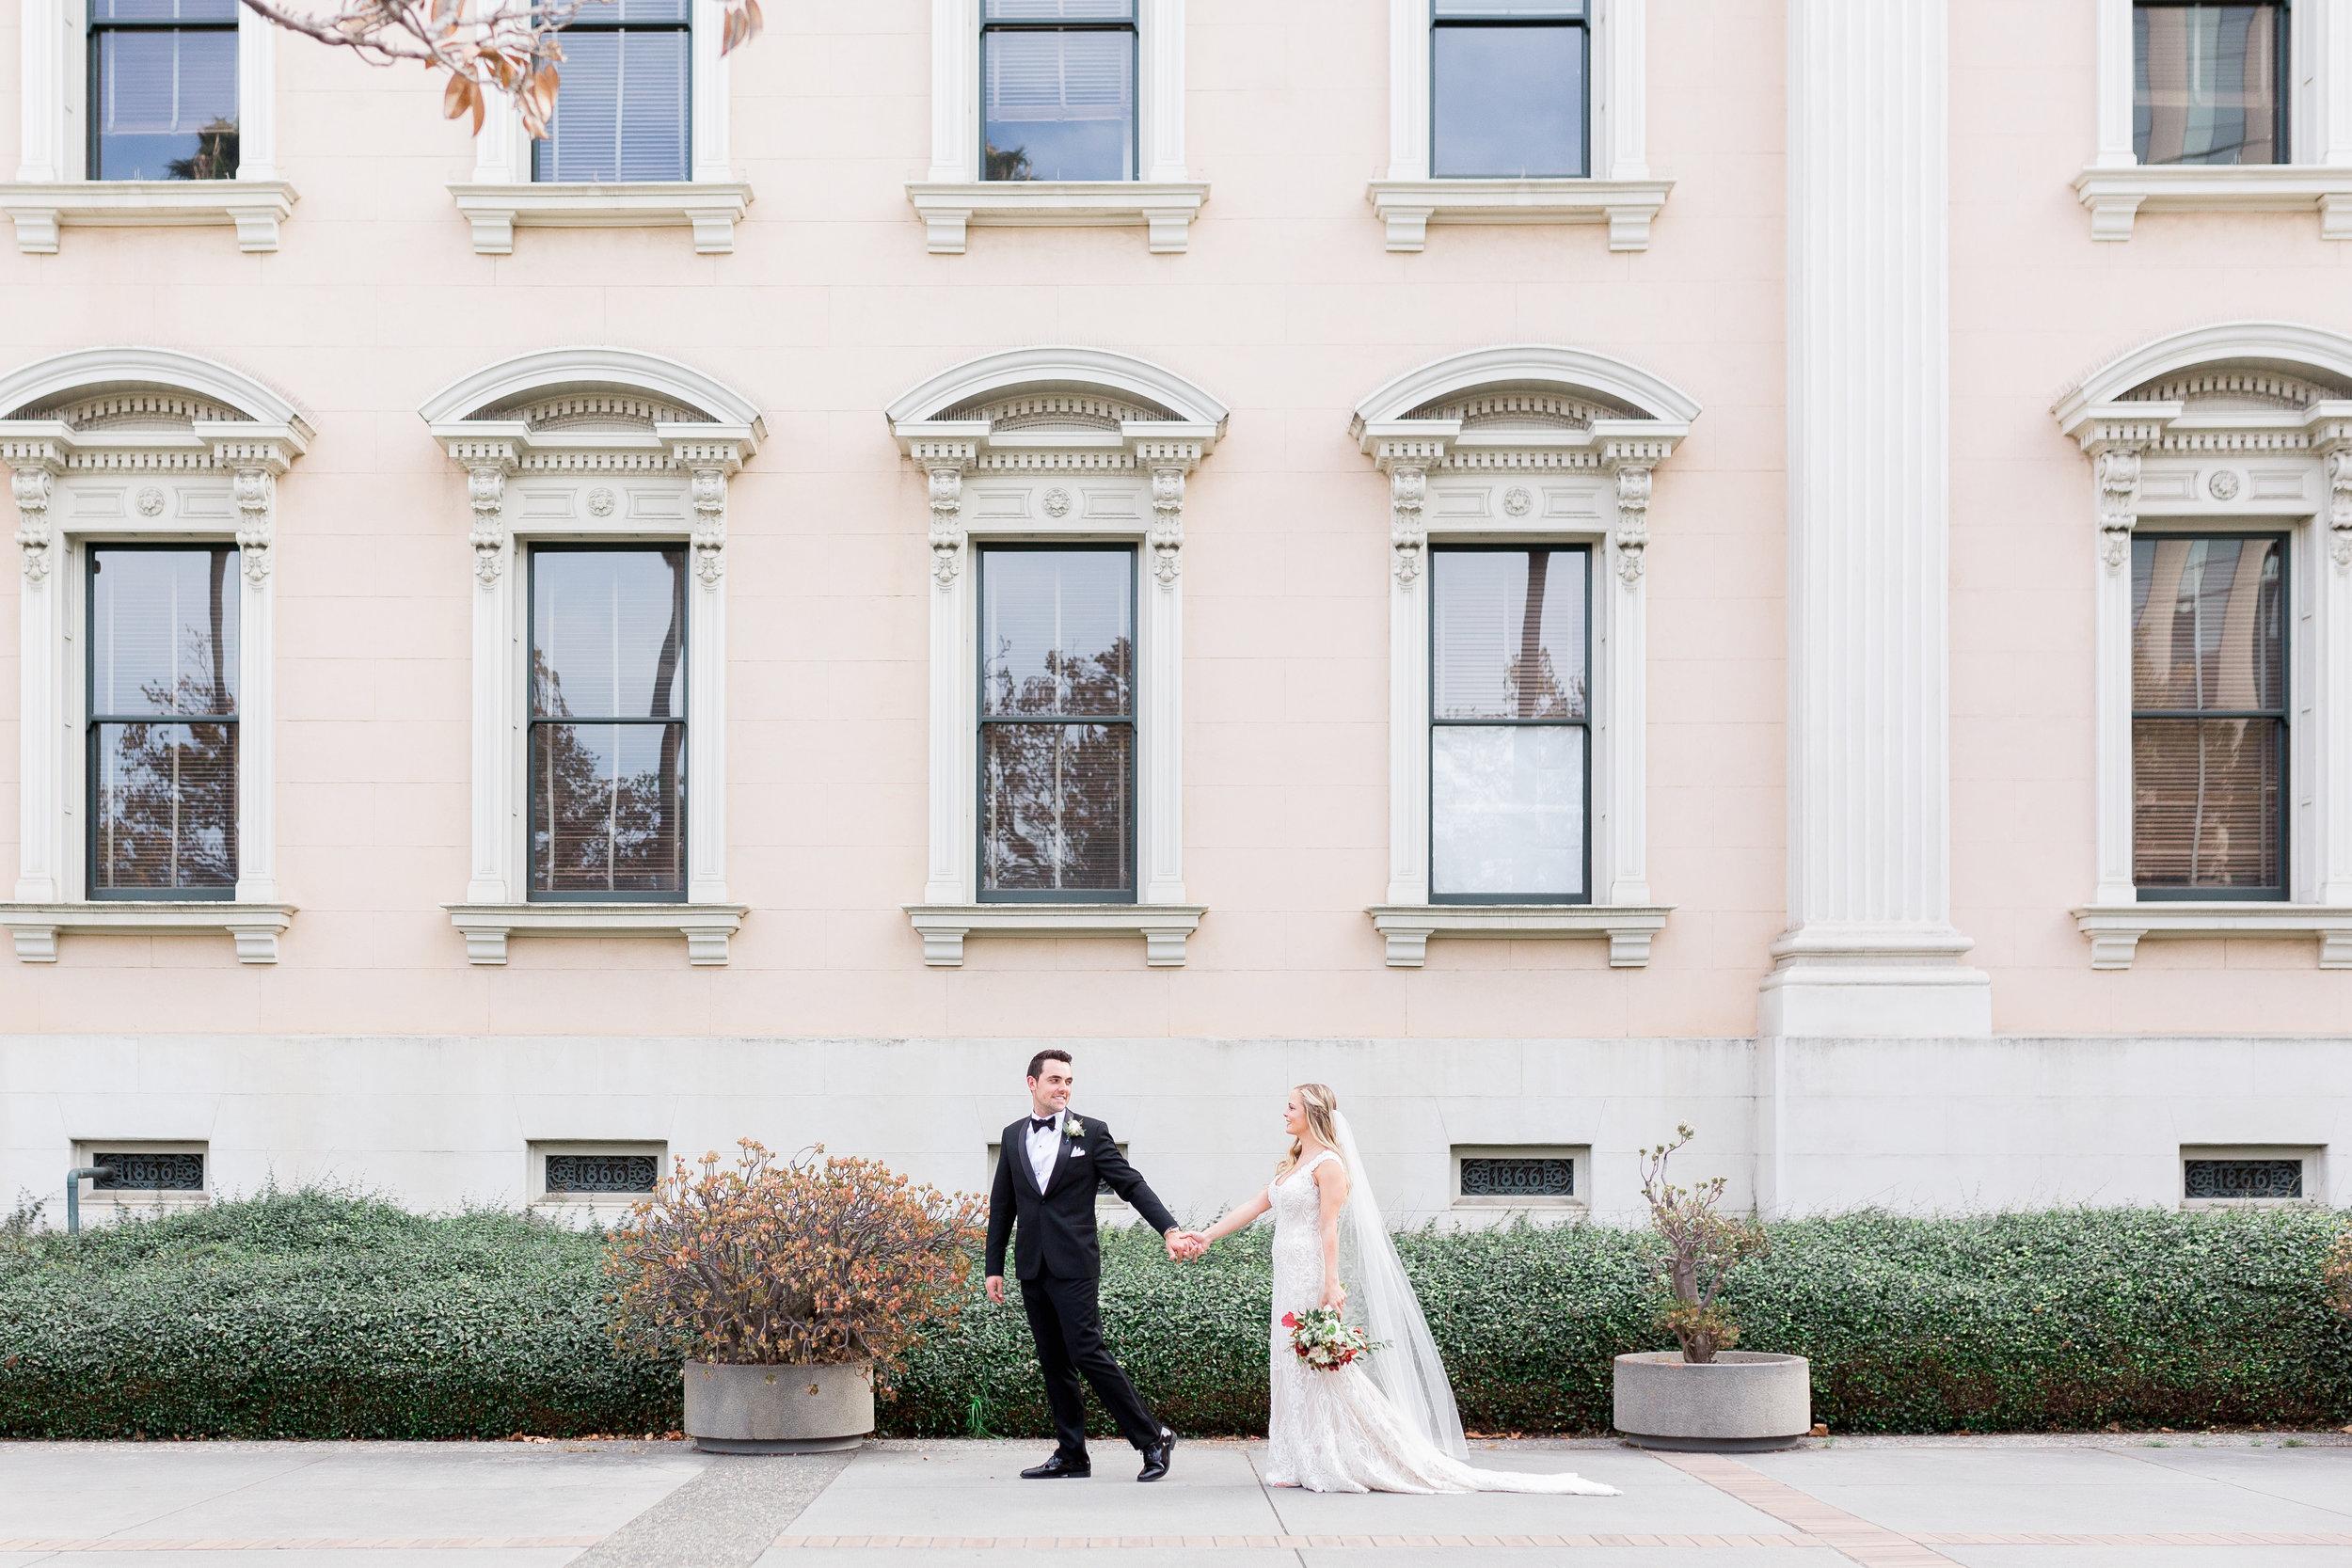 bride-and-groom-photos-in-Downtown-San-Jose-california(70 of 335).jpg